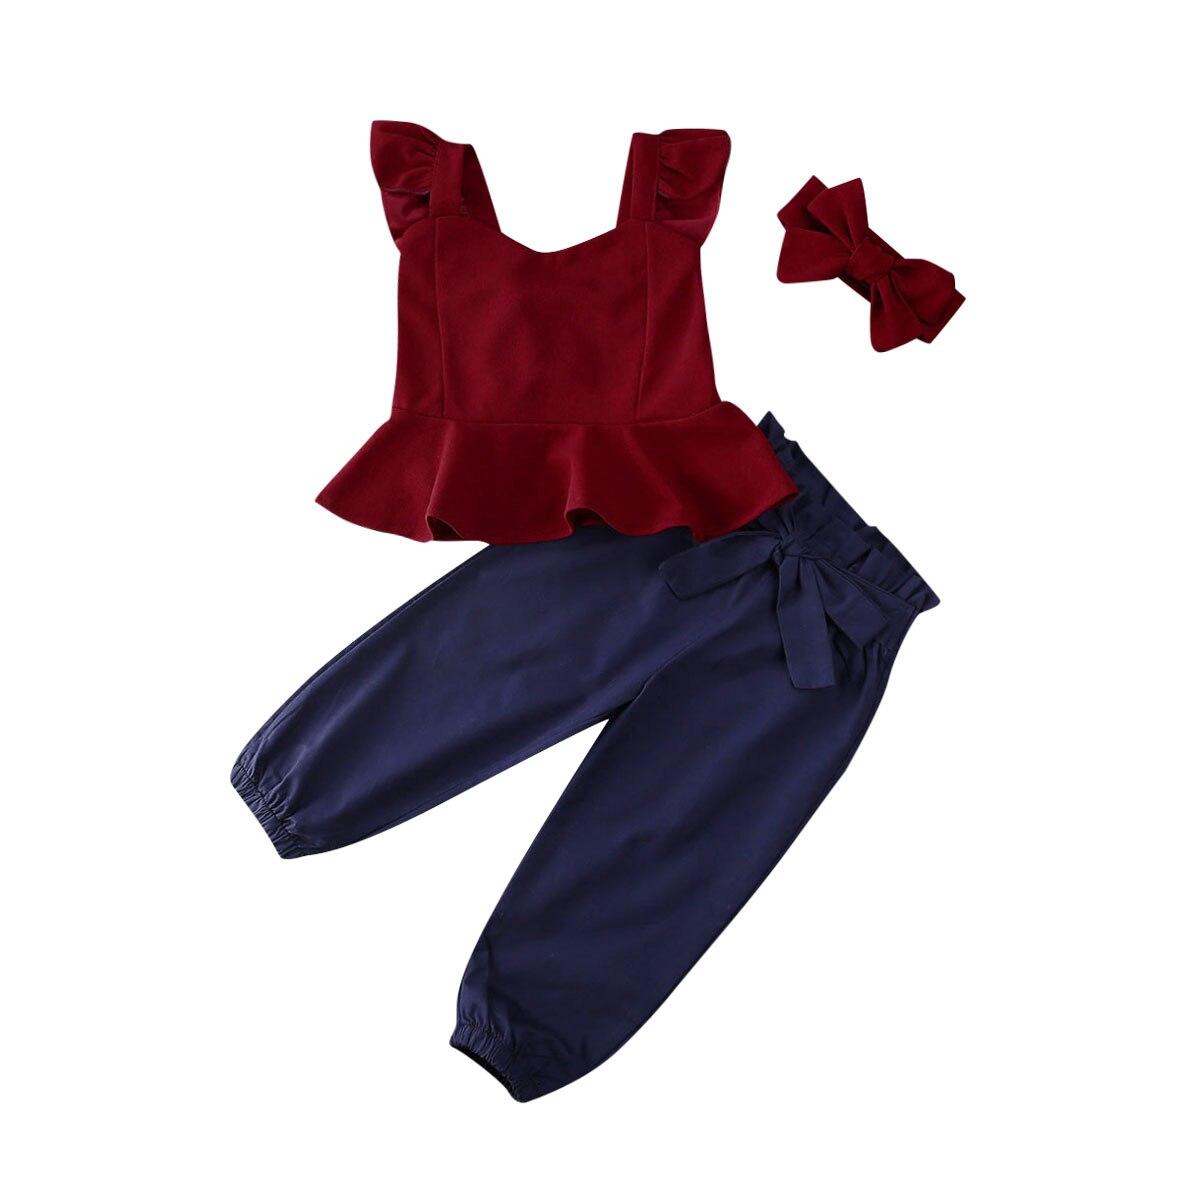 New 3Pcs Toddler Baby Girl Sling Tops Long Pants Headband Outfit Clothes Summer 1-6yrs